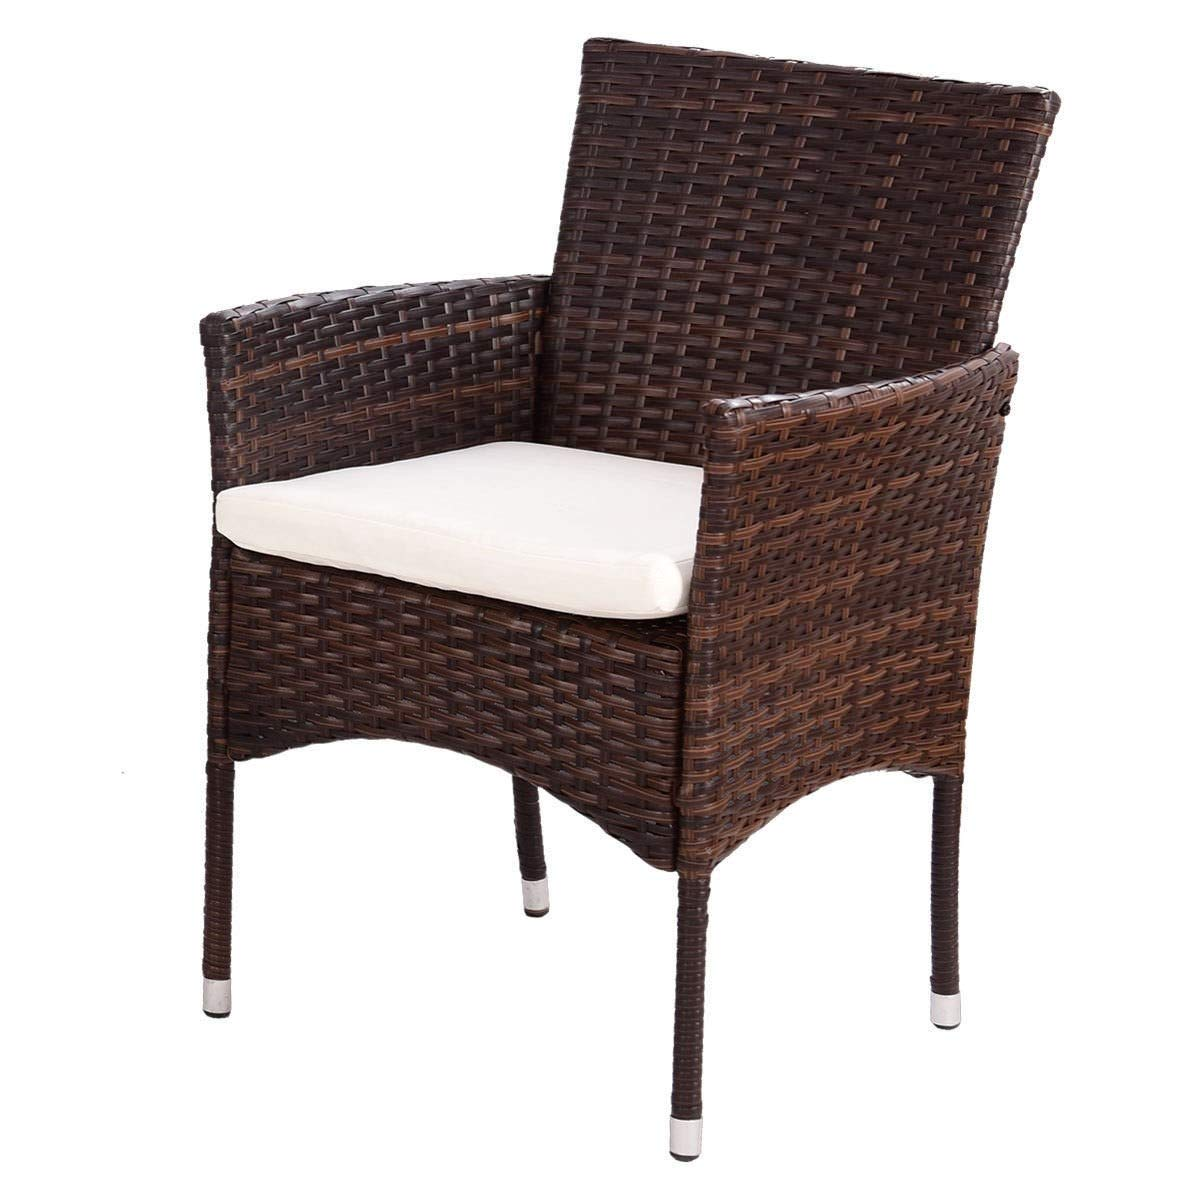 EnjoyShop 4 Pcs PE Rattan Wicker Table Shelf Sofa Furniture Set with Cushion Dining Garden Picnic Outdoor by EnjoyShop (Image #10)